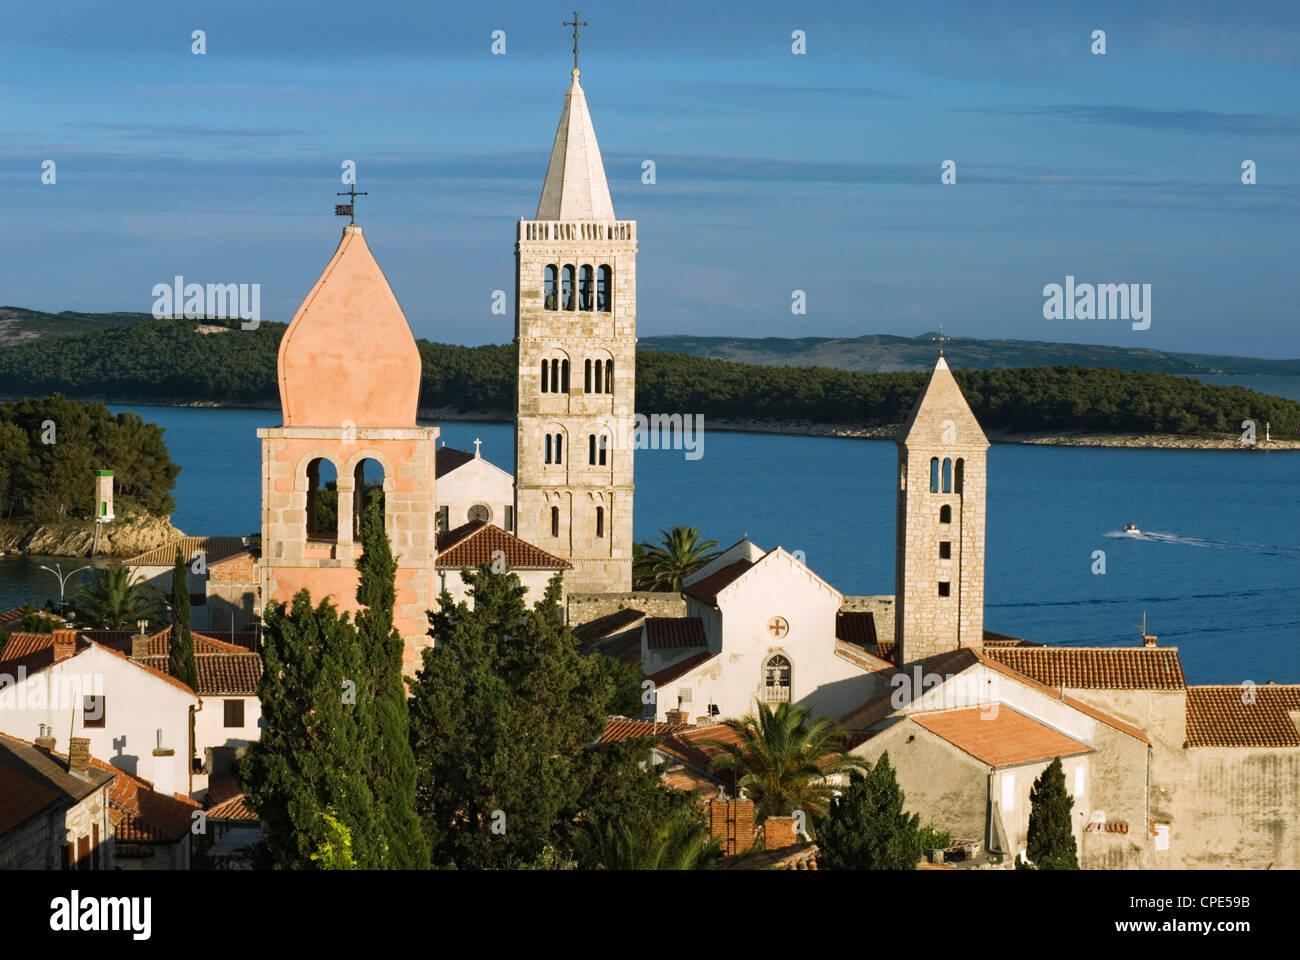 View over campaniles of old town, Rab Town, Rab Island, Kvarner Gulf, Croatia, Adriatic, Europe - Stock Image